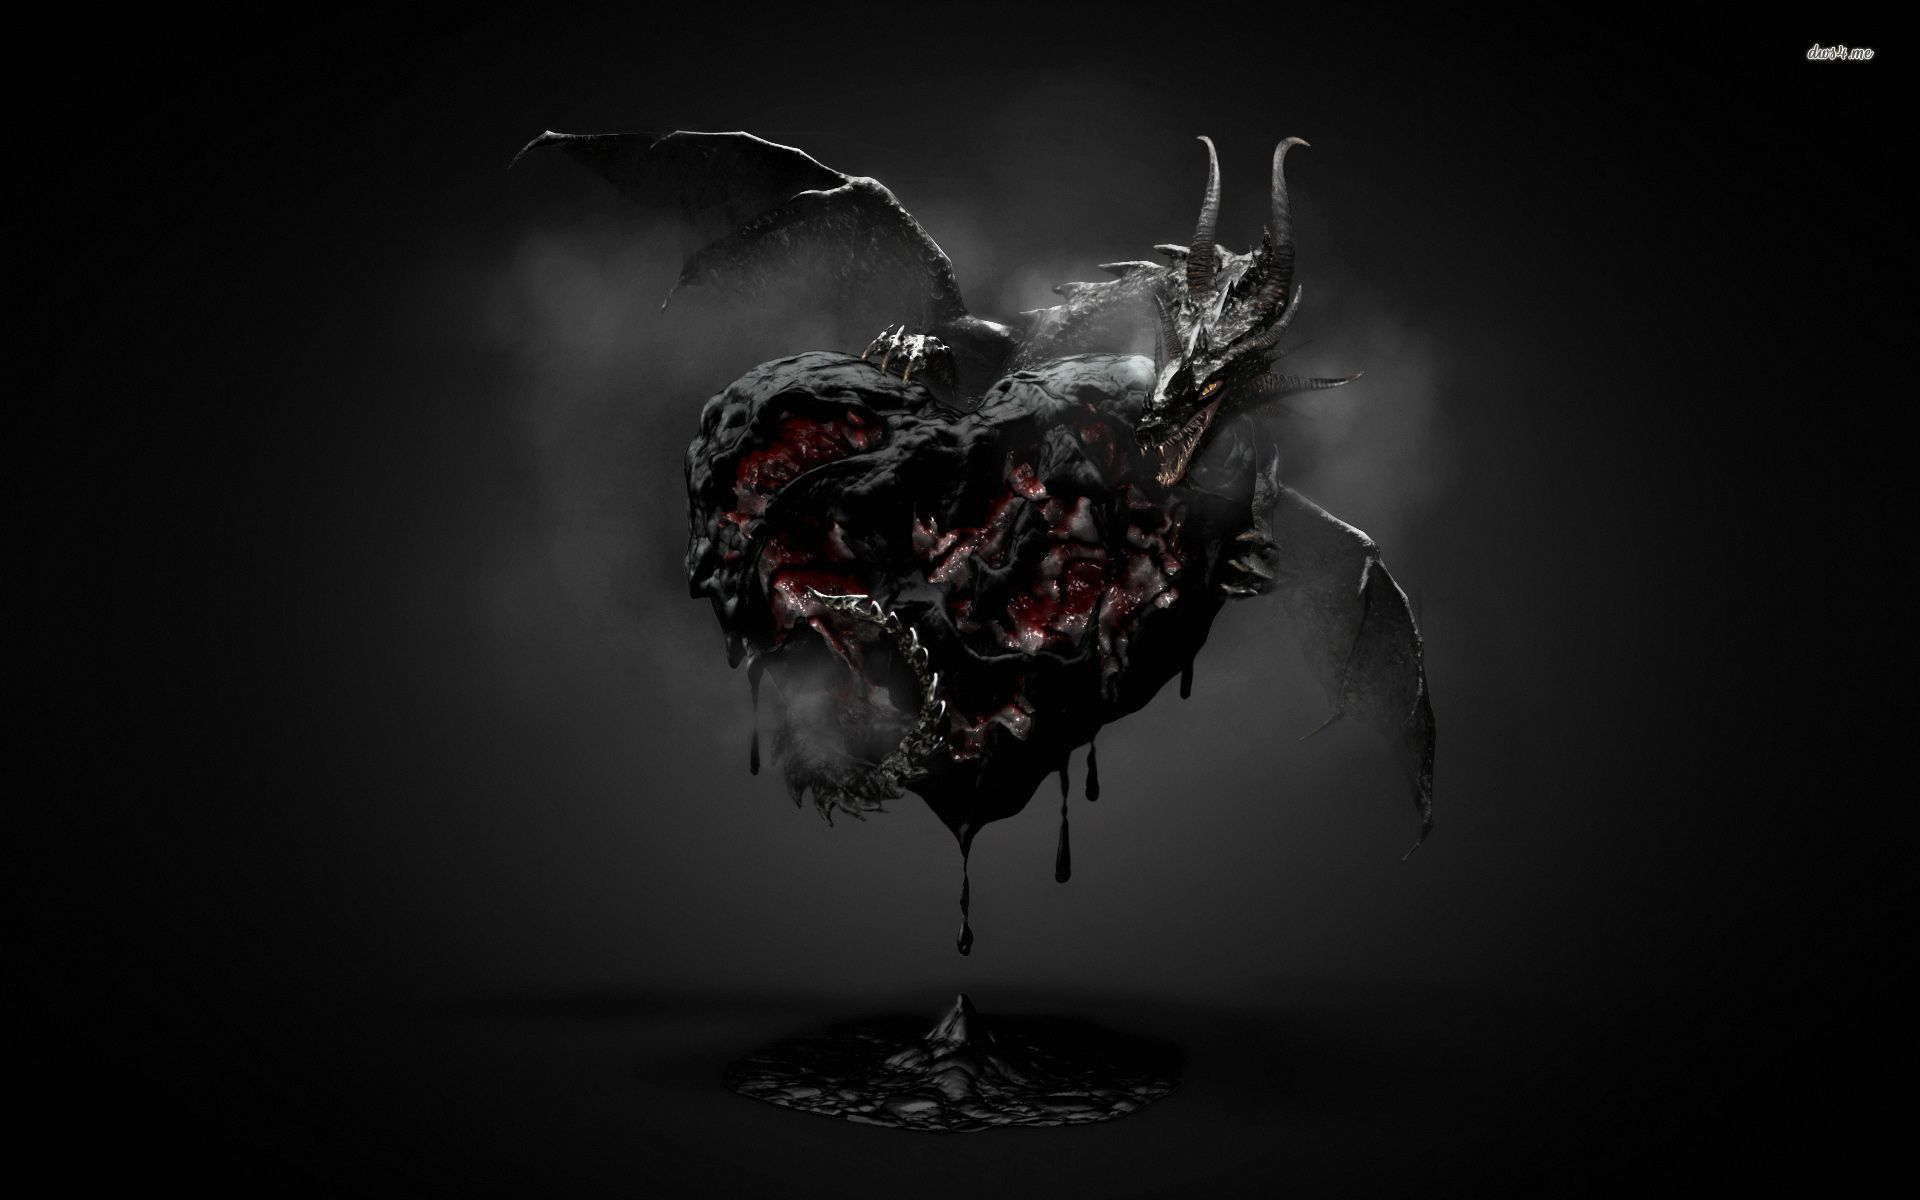 Black Dragon 1080p Wallpapers Free Wallpaper i0y